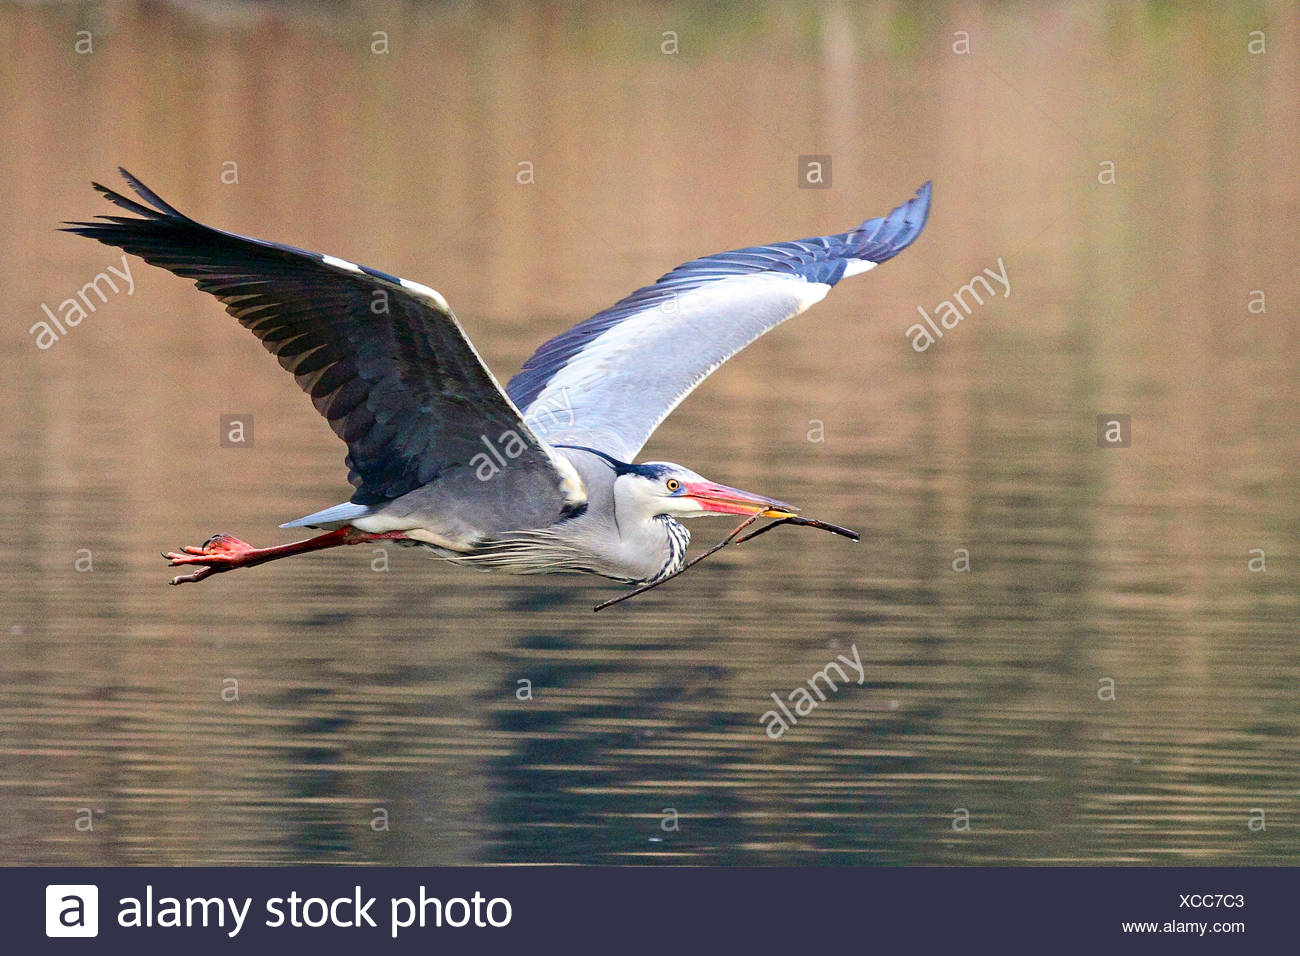 grey heron (Ardea cinerea), in flight, Germany - Stock Image